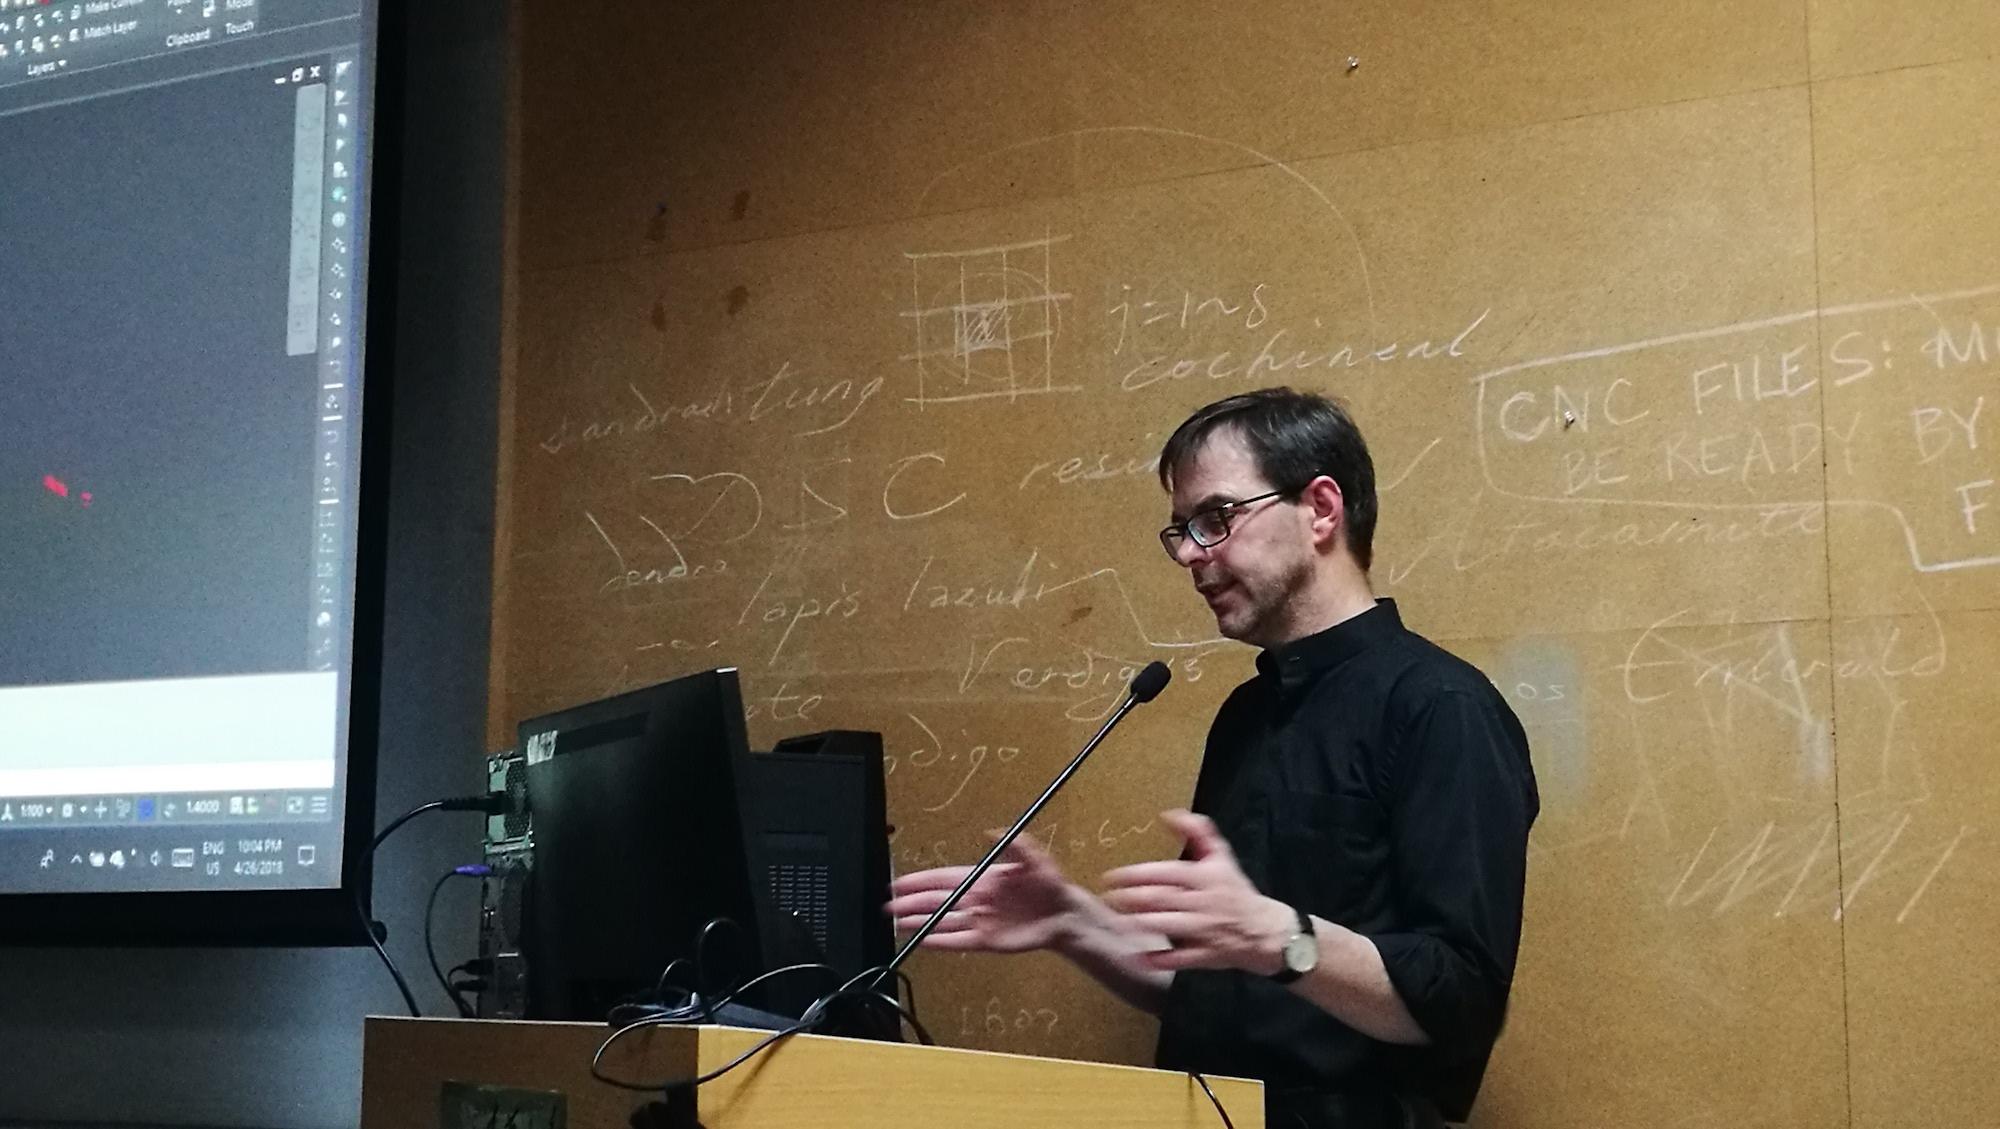 LA-FRIDAY学术小沙龙邀请Andreas Luka做报告